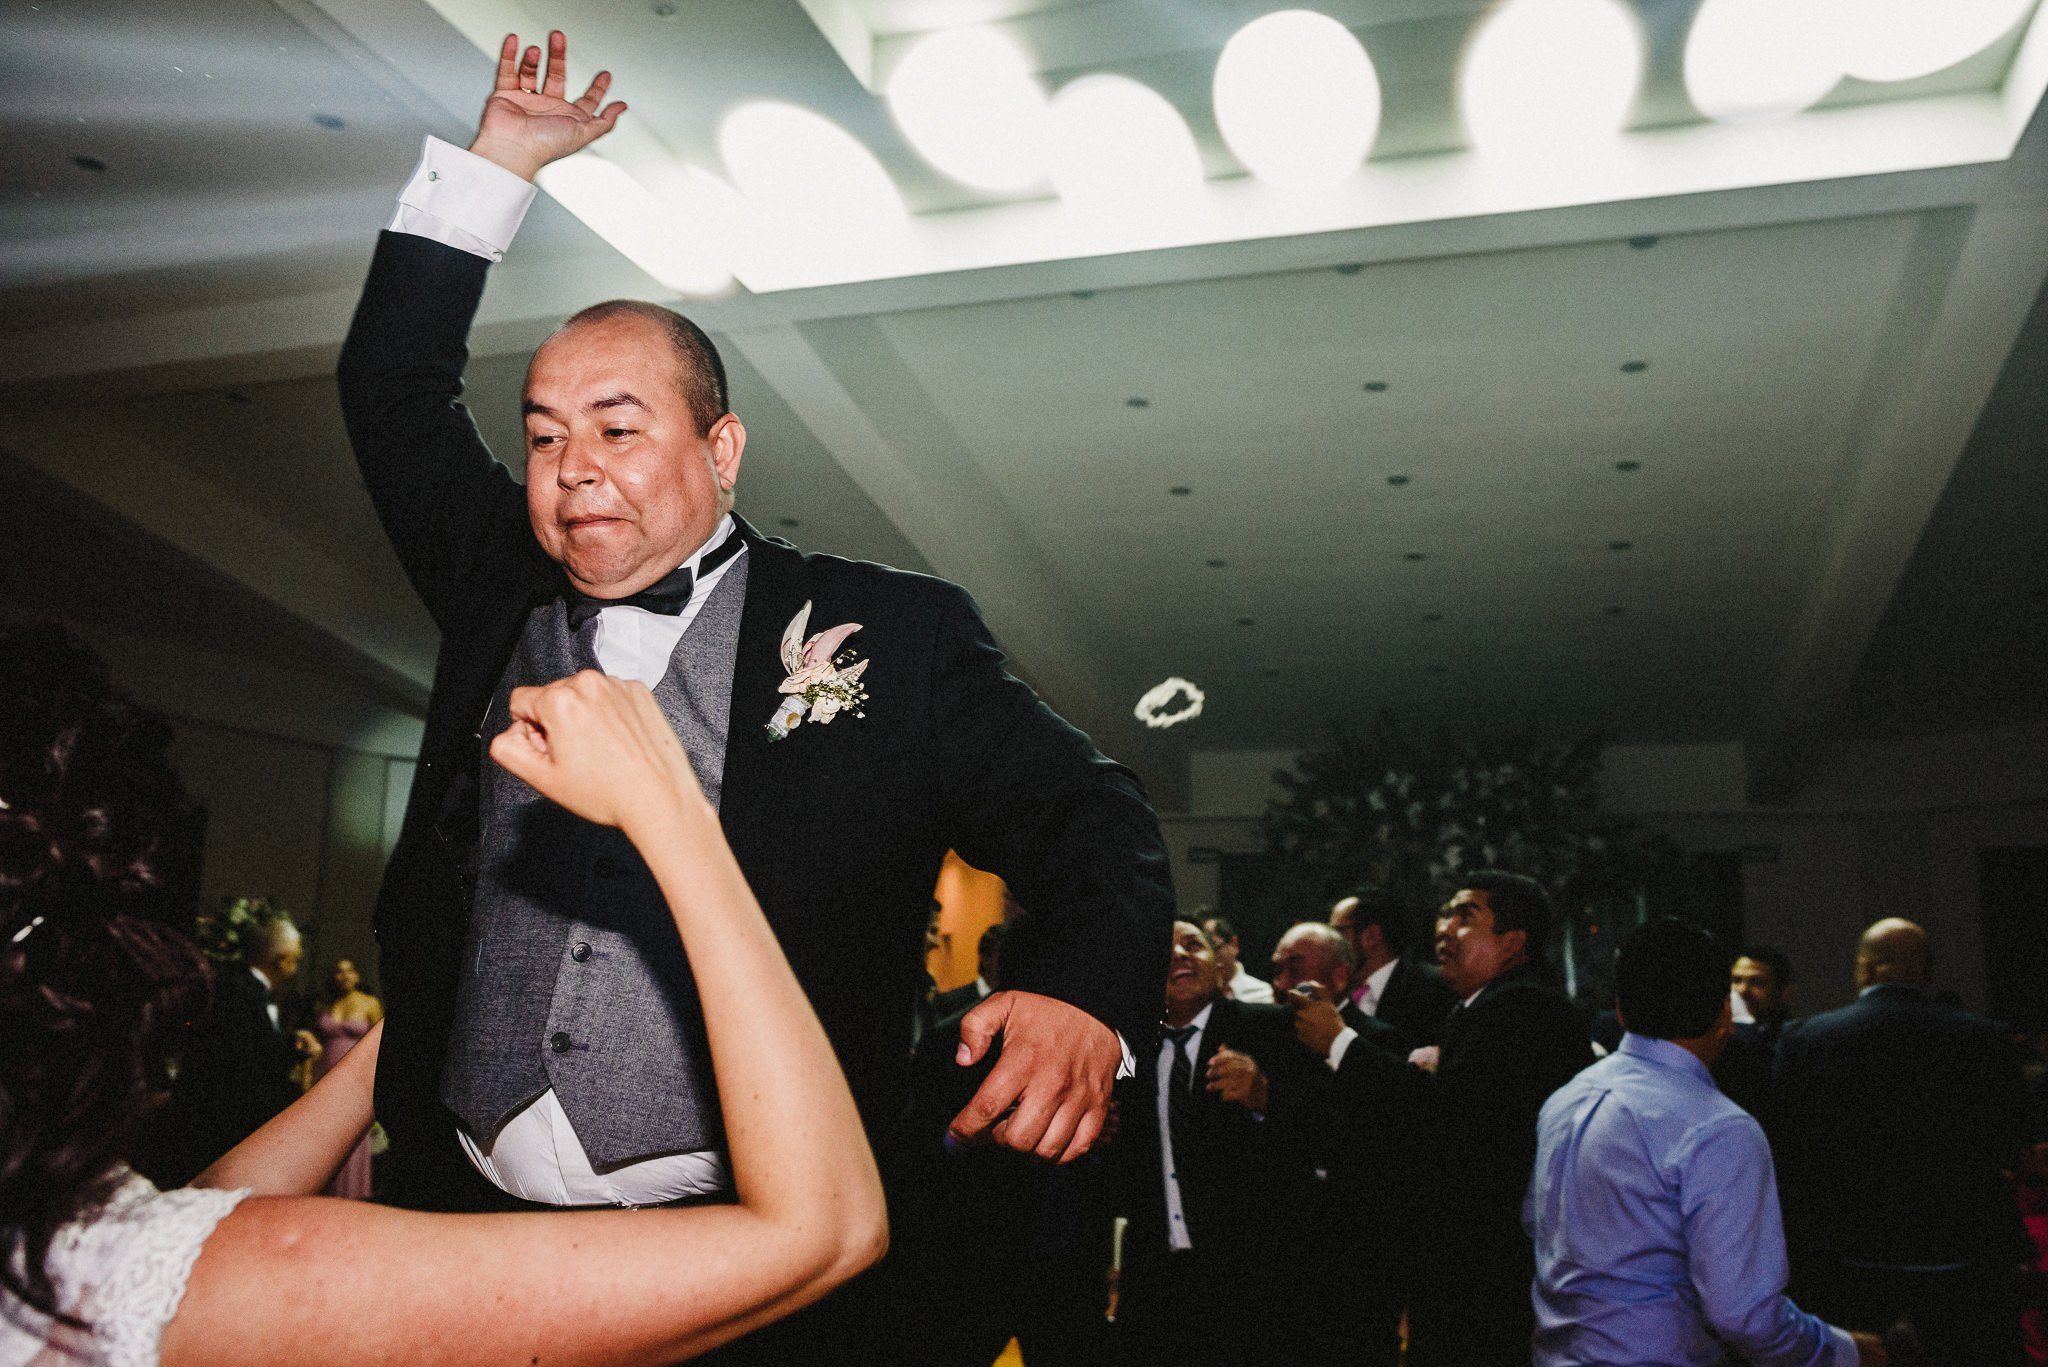 Wedding-Boda-Tulancingo-Hidalgo-Salon-Essenzia-Luis-Houdin-73-film